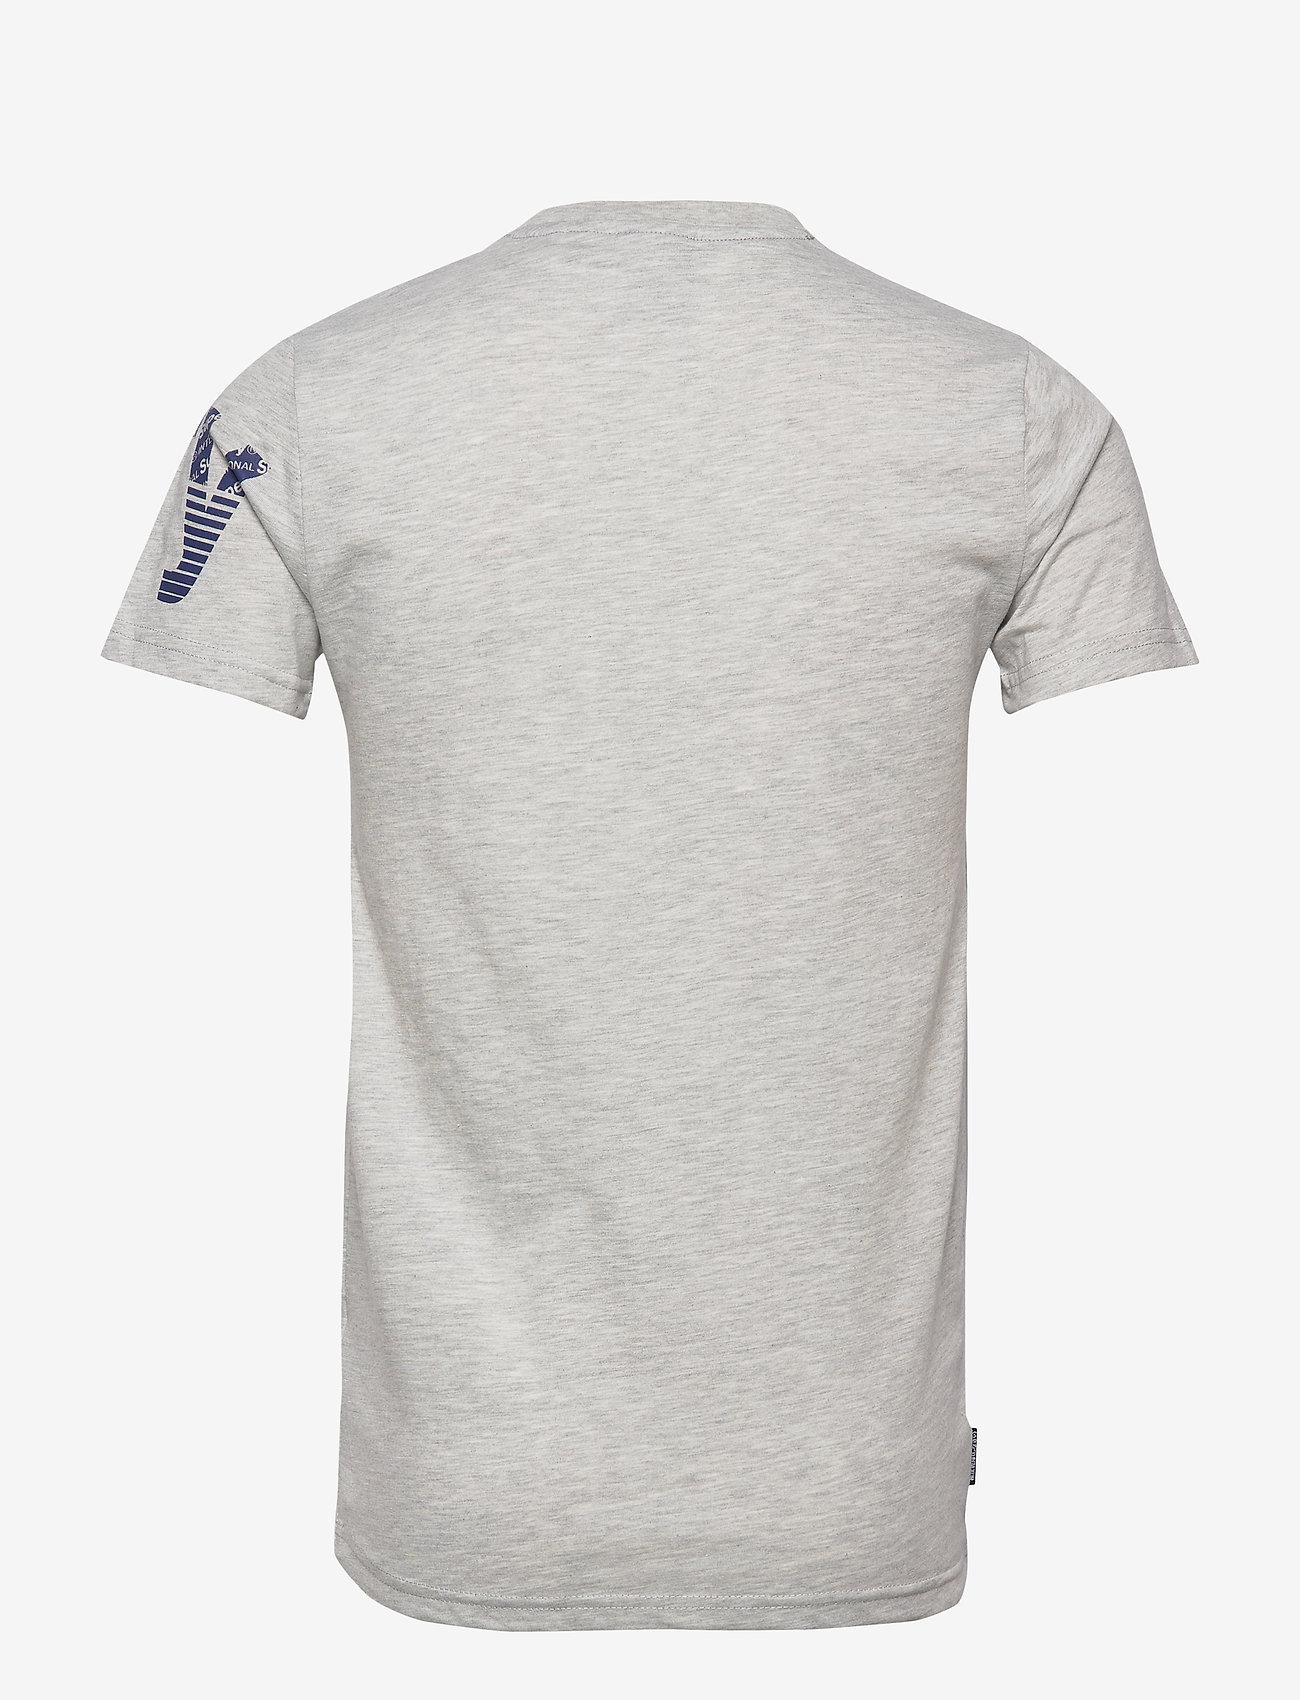 Superdry - CORE SPLIT LOGO TEE - kortermede t-skjorter - collective light marl